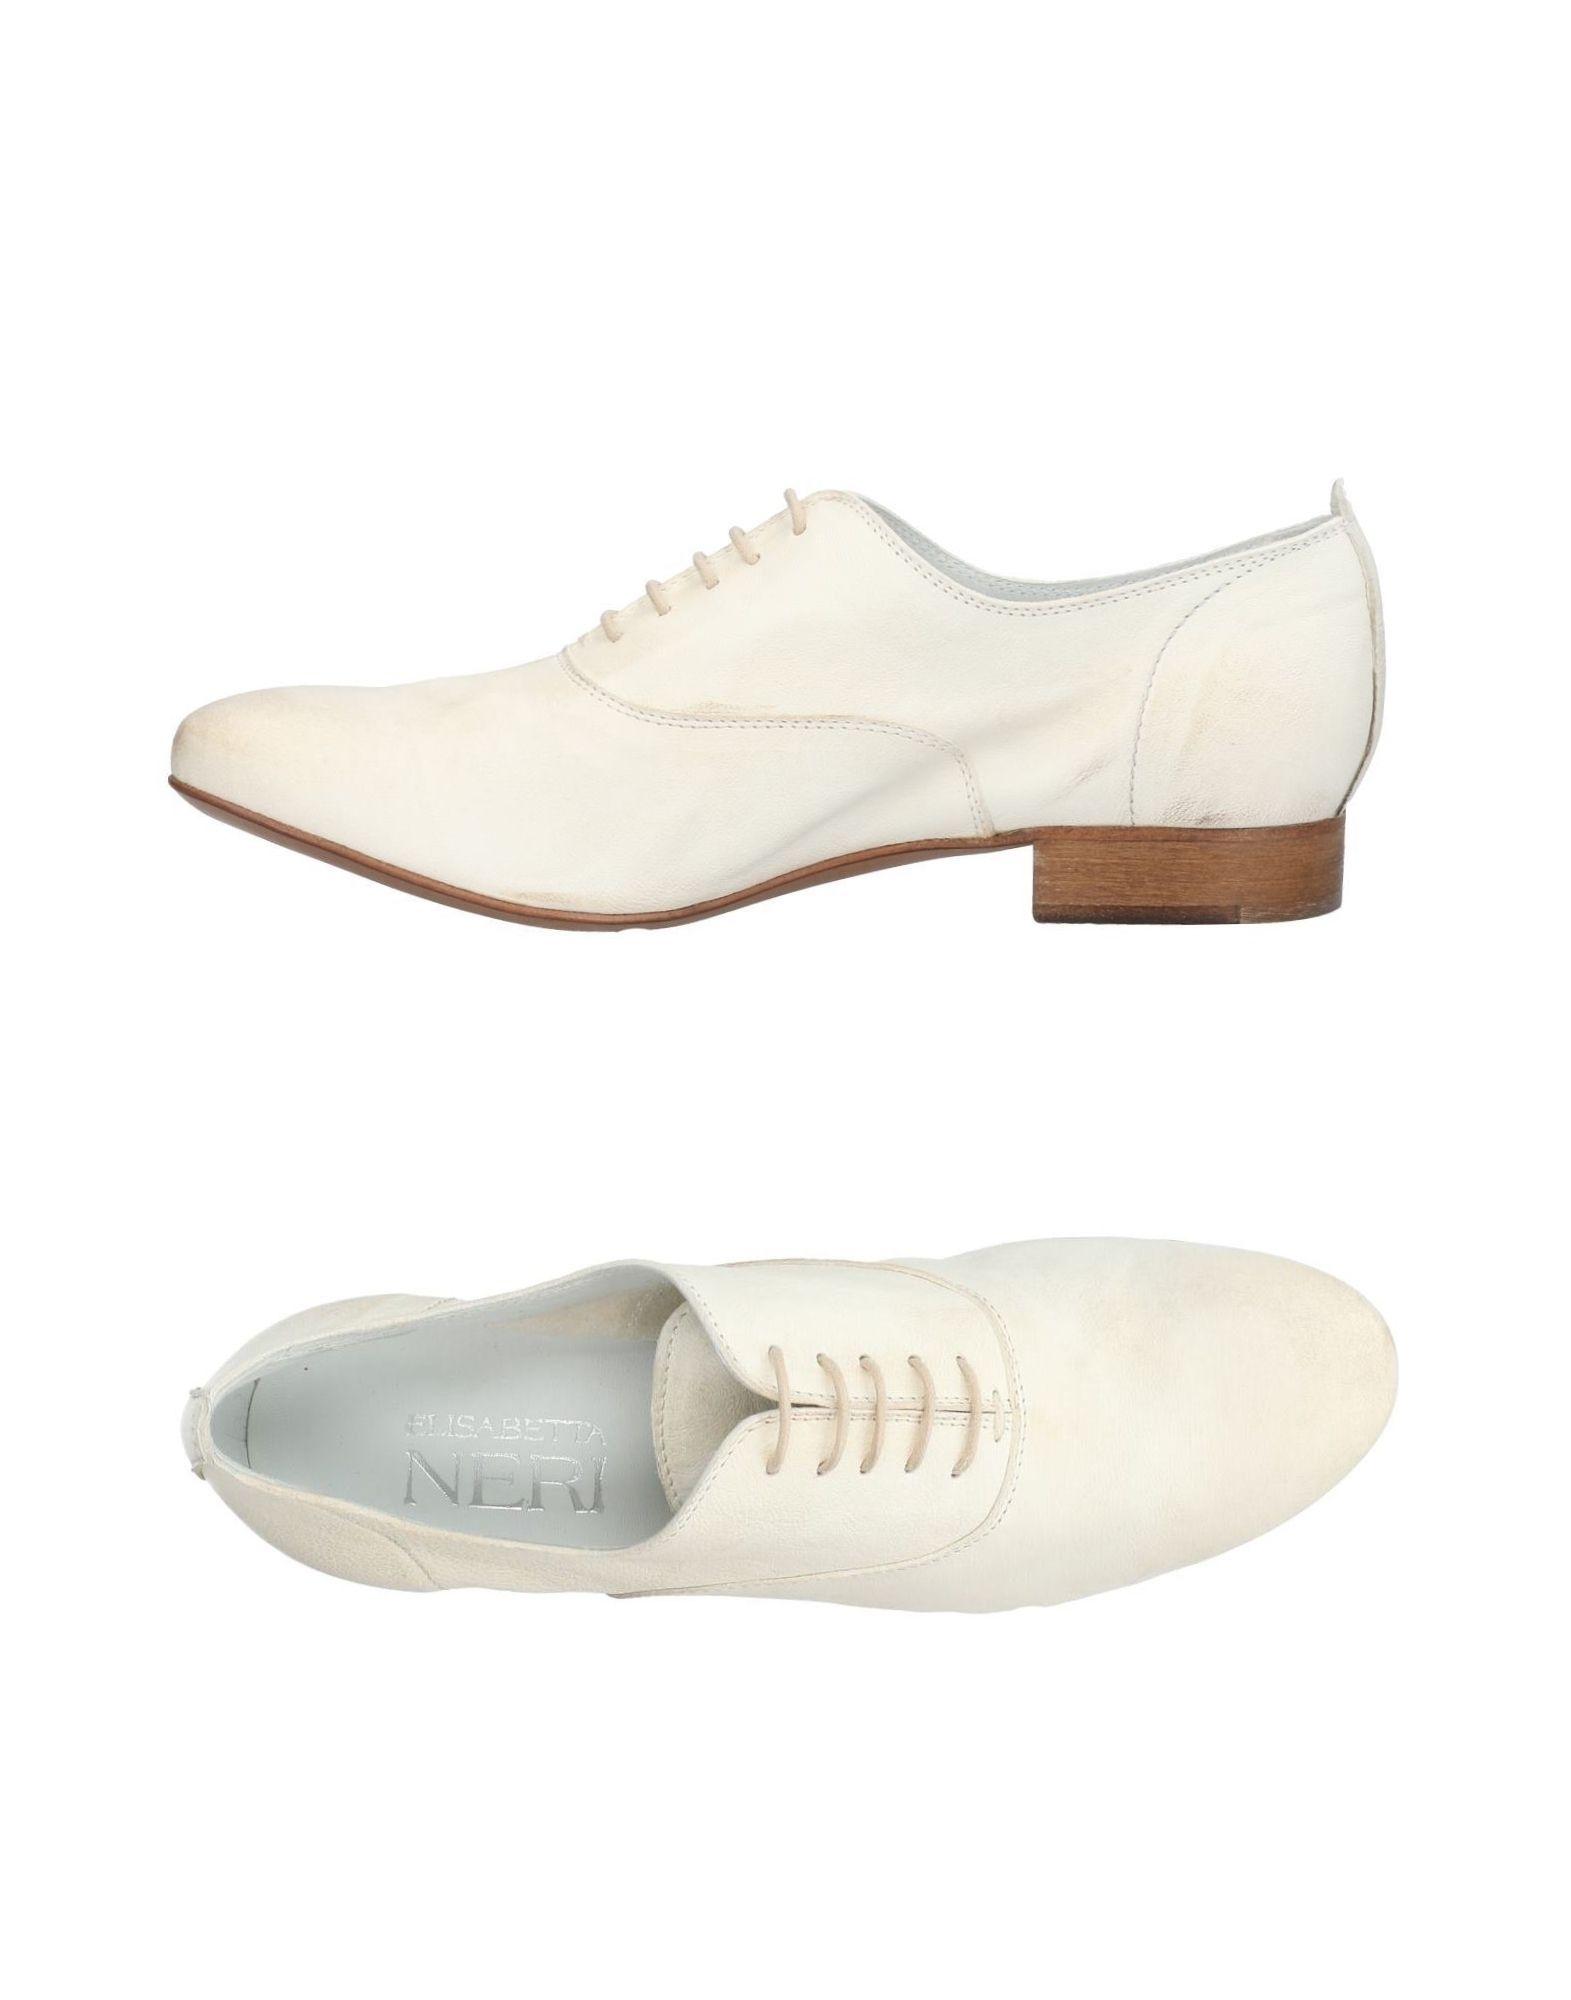 ELISABETTA NERI Обувь на шнурках обложка neri karra